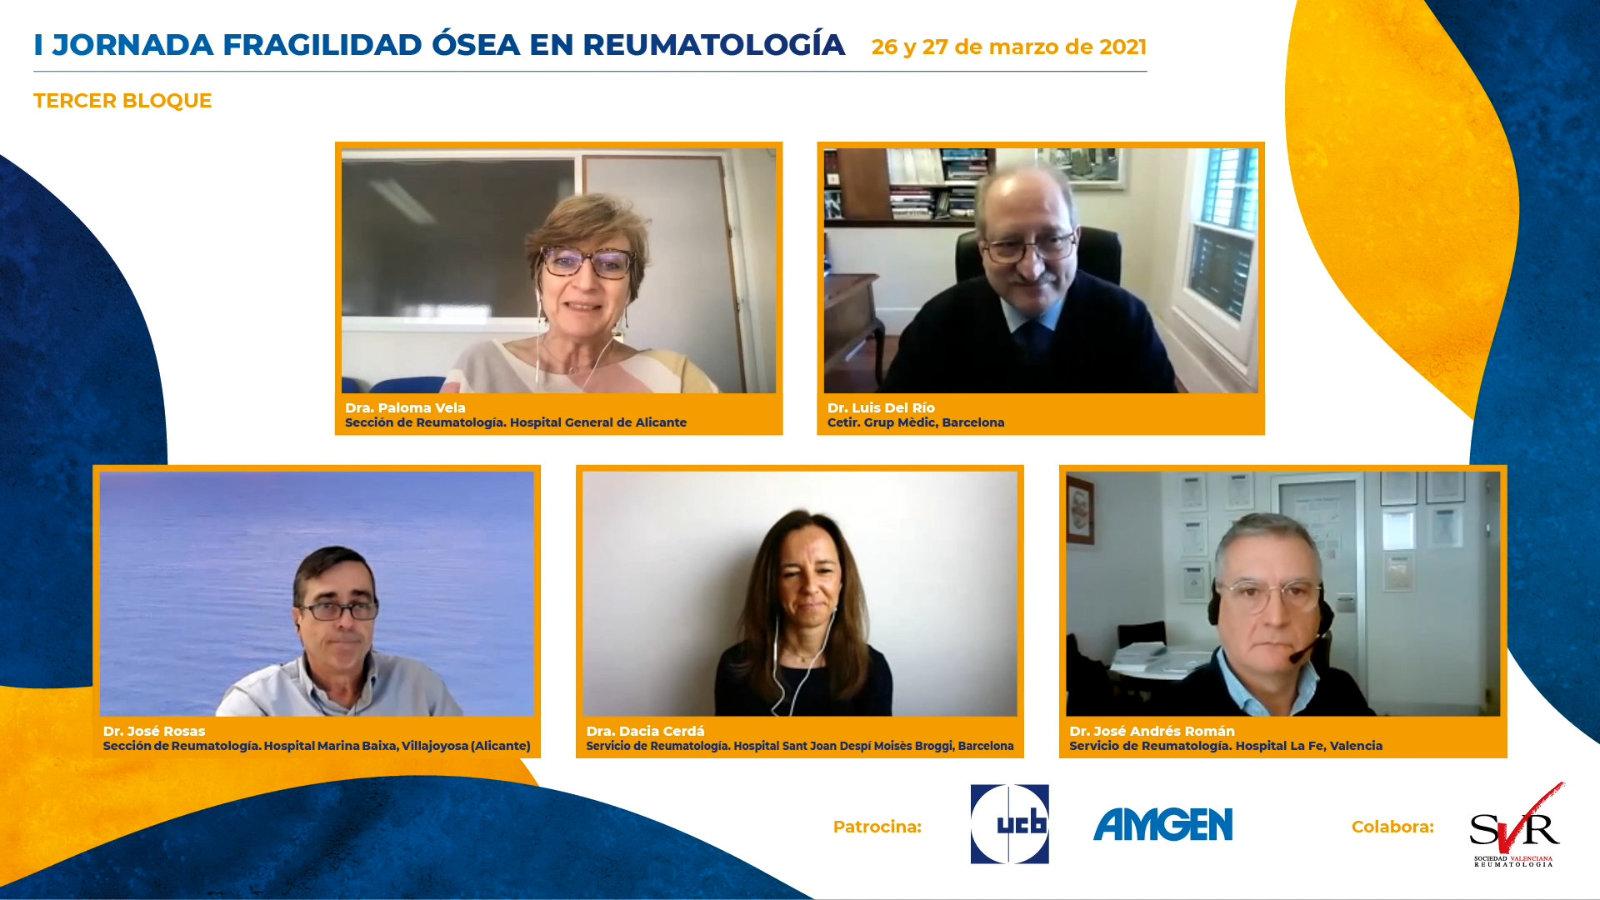 I Jornada Fragilidad Ósea en Reumatología 2021: Tercer bloque